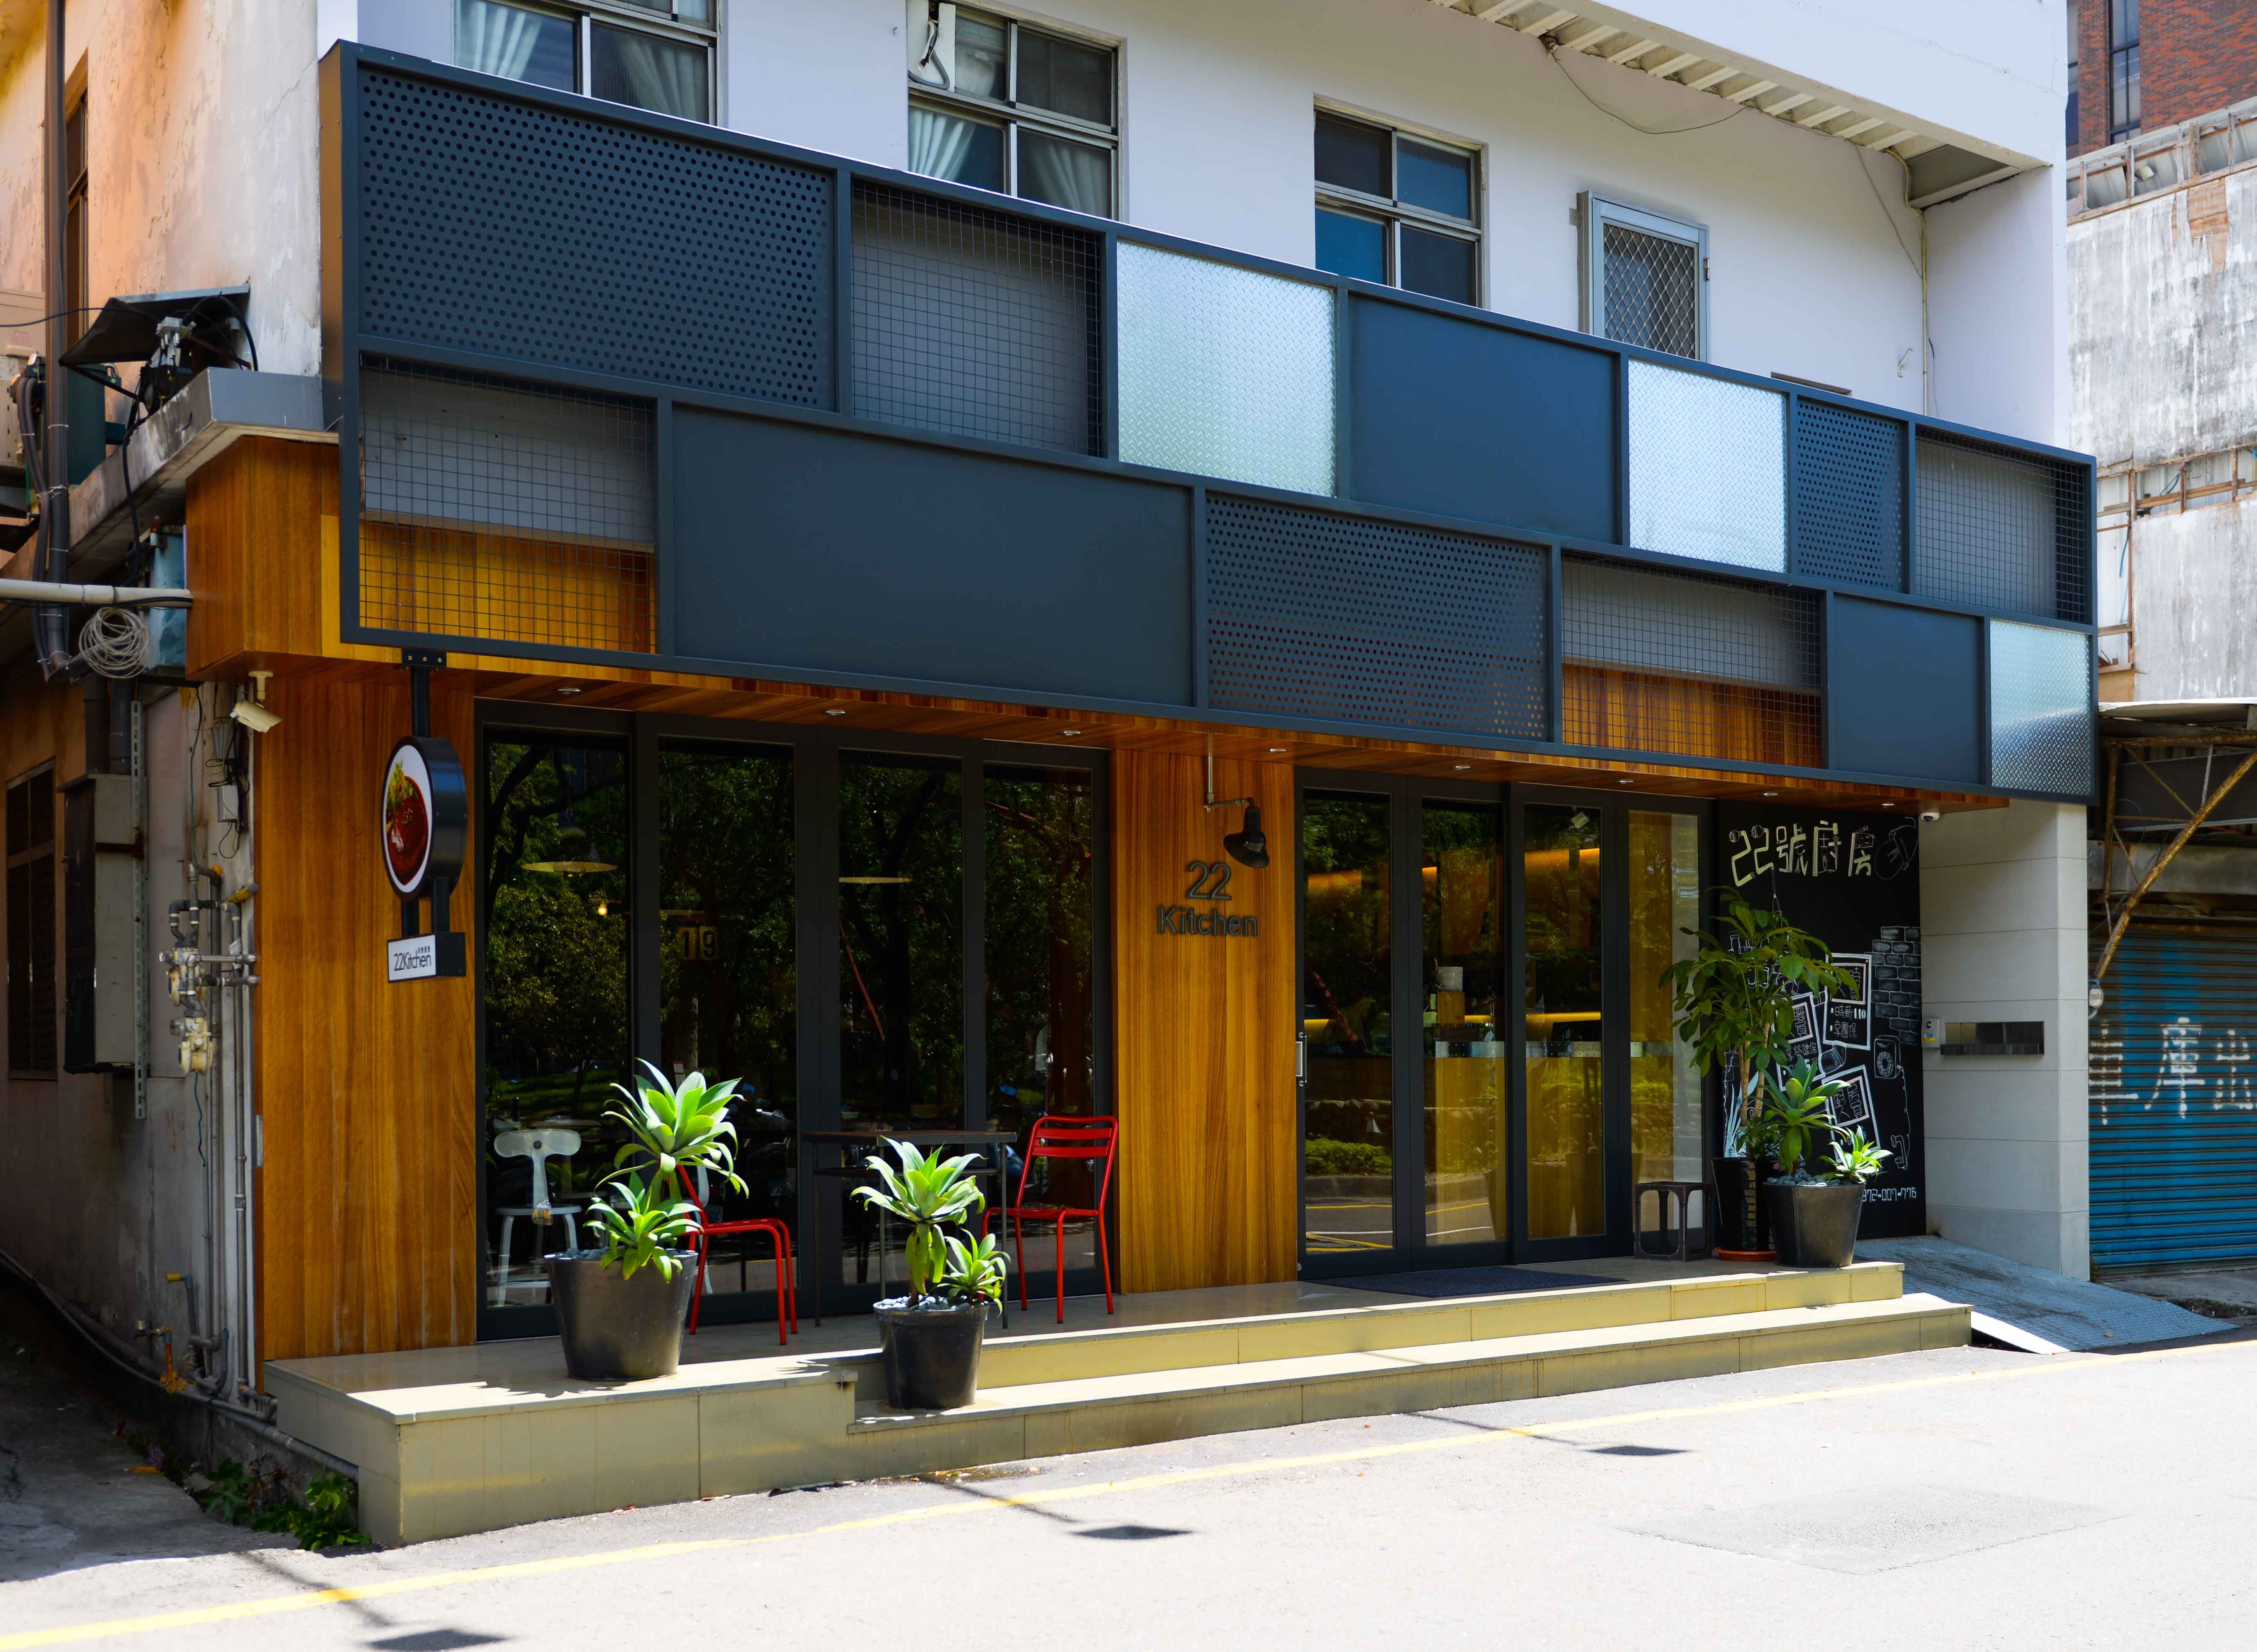 Alan Ford Caffe Pivnica Alan Ford City Kvart Svirke